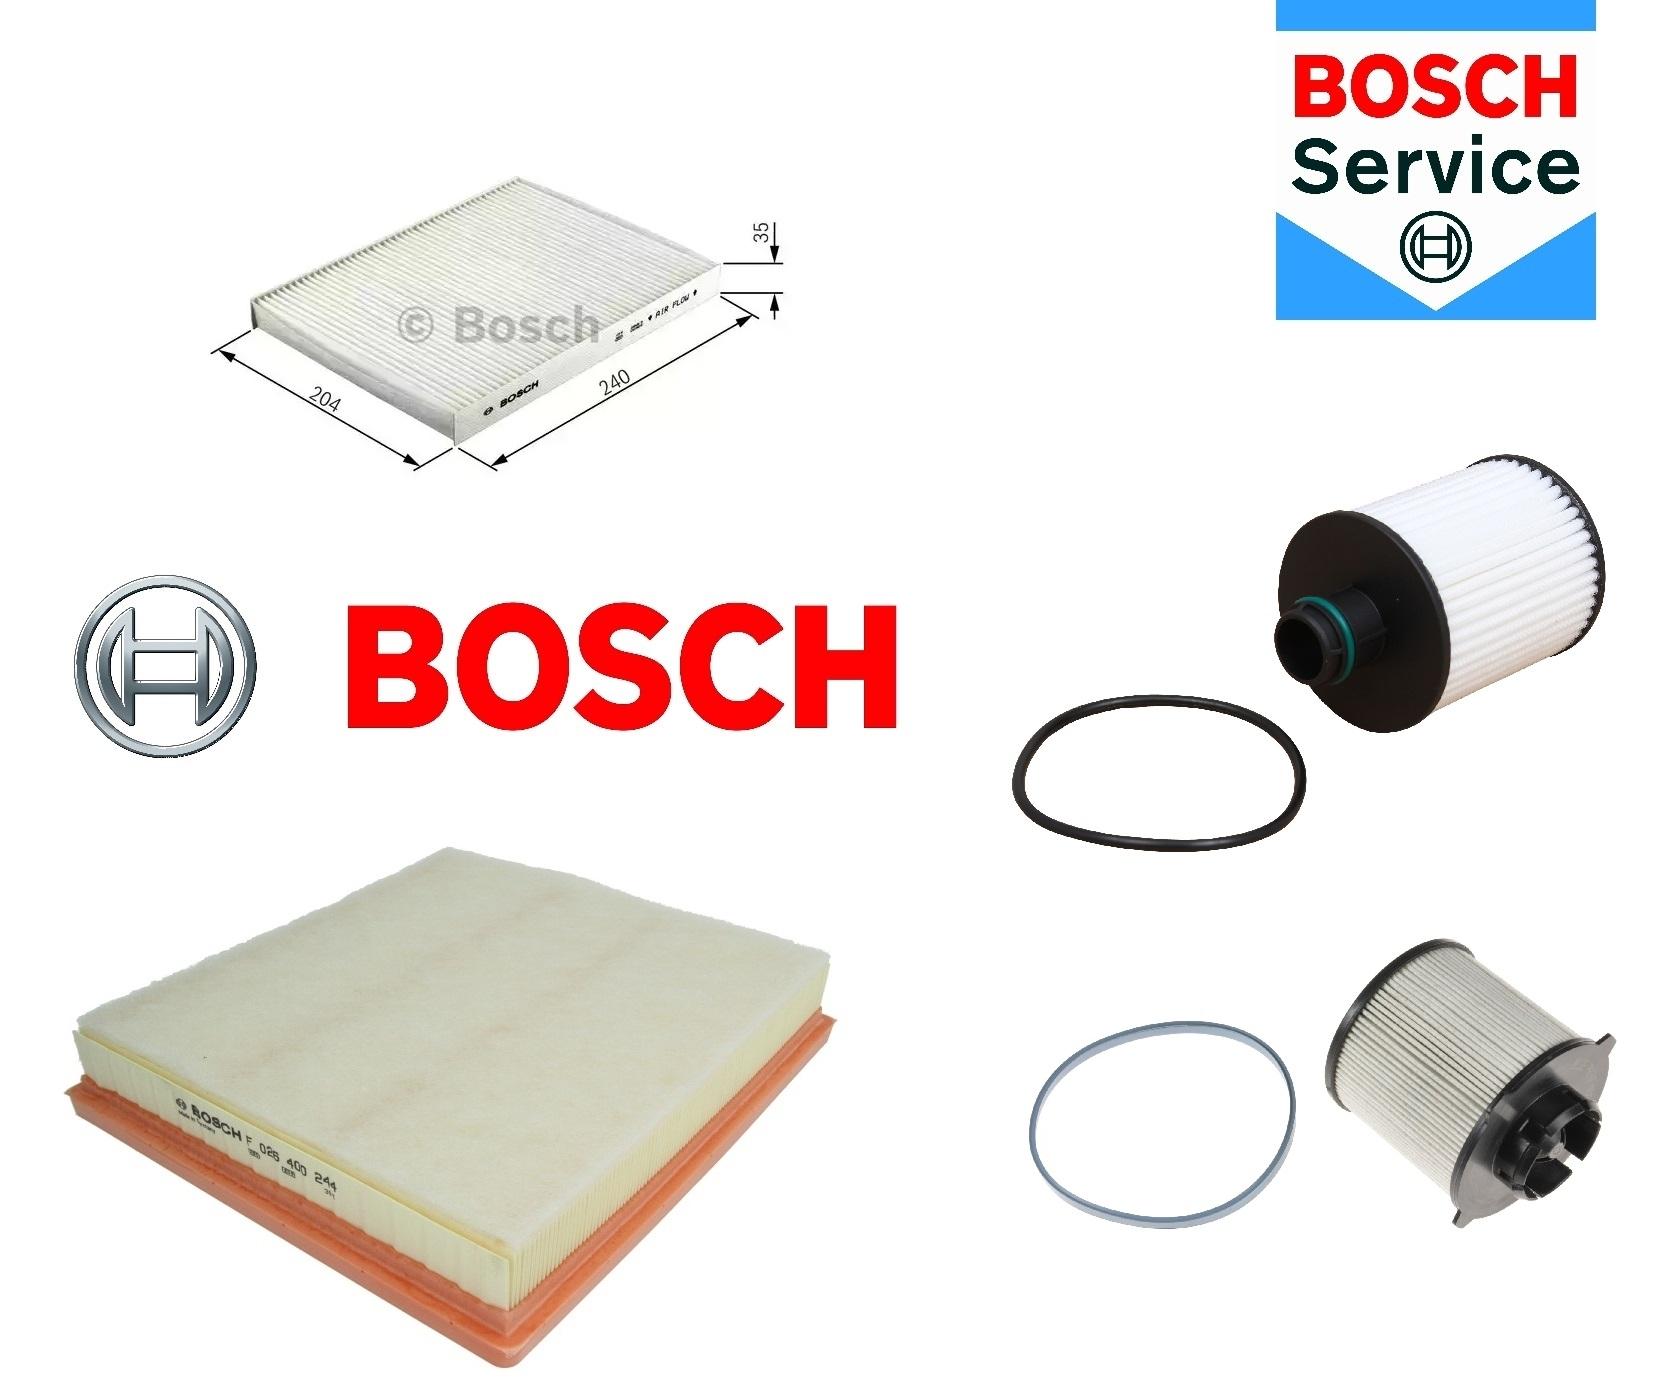 Pachet Filtre Bosch Vw Passat (3b3) 1.6 Tip Motor Alz 75 Kw